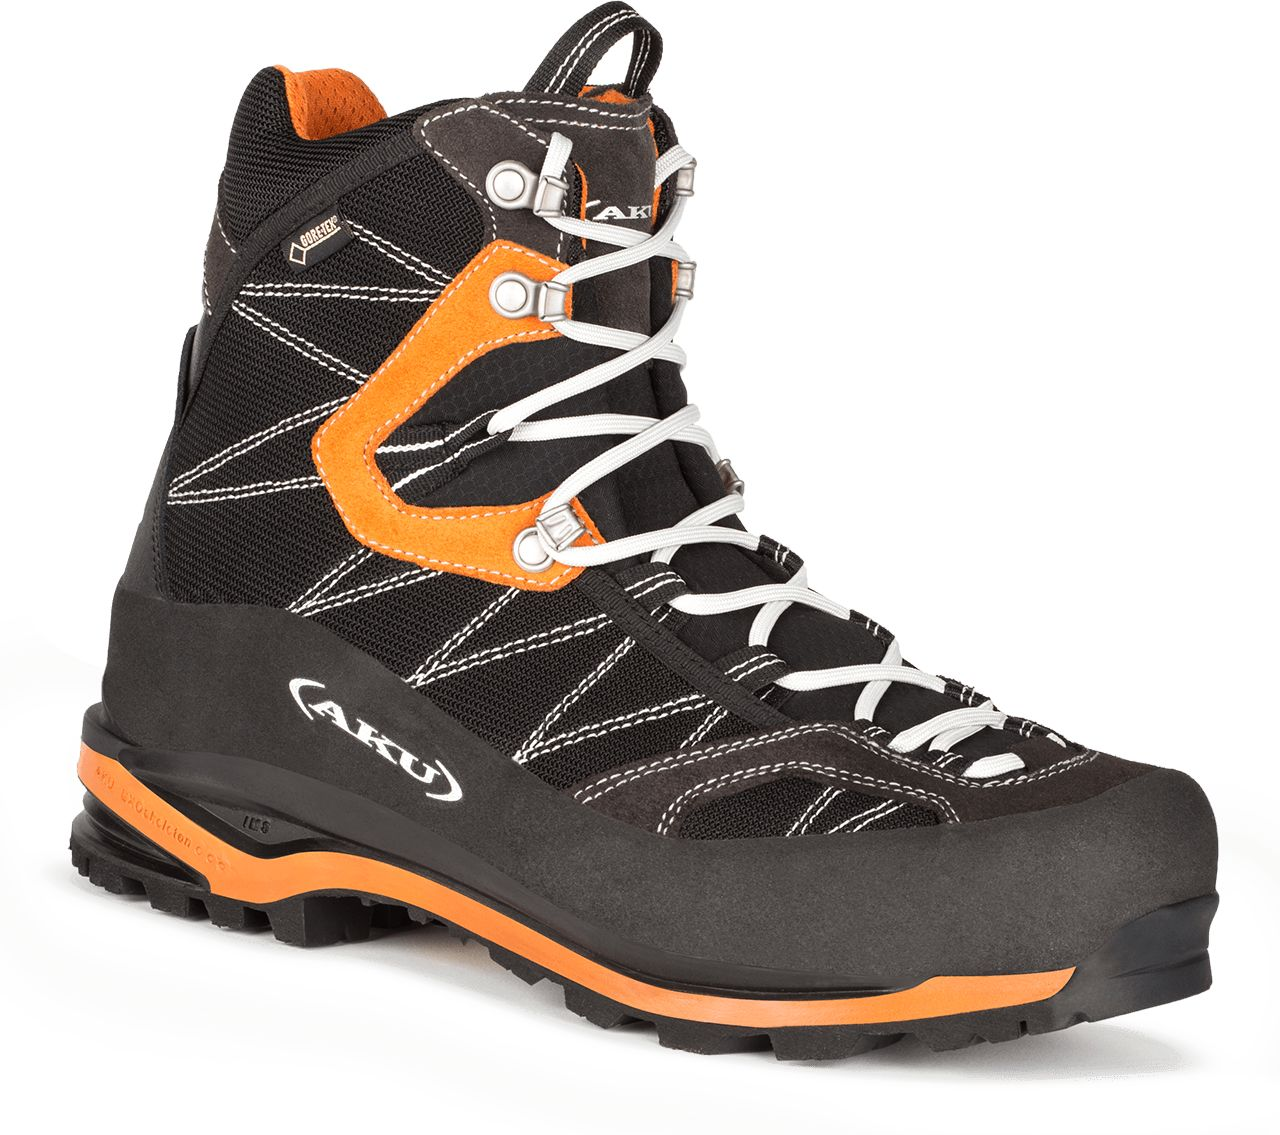 Aku Buty meskie Tangu Lite GTX black/ orange r. 42 975-108-8 Tūrisma apavi